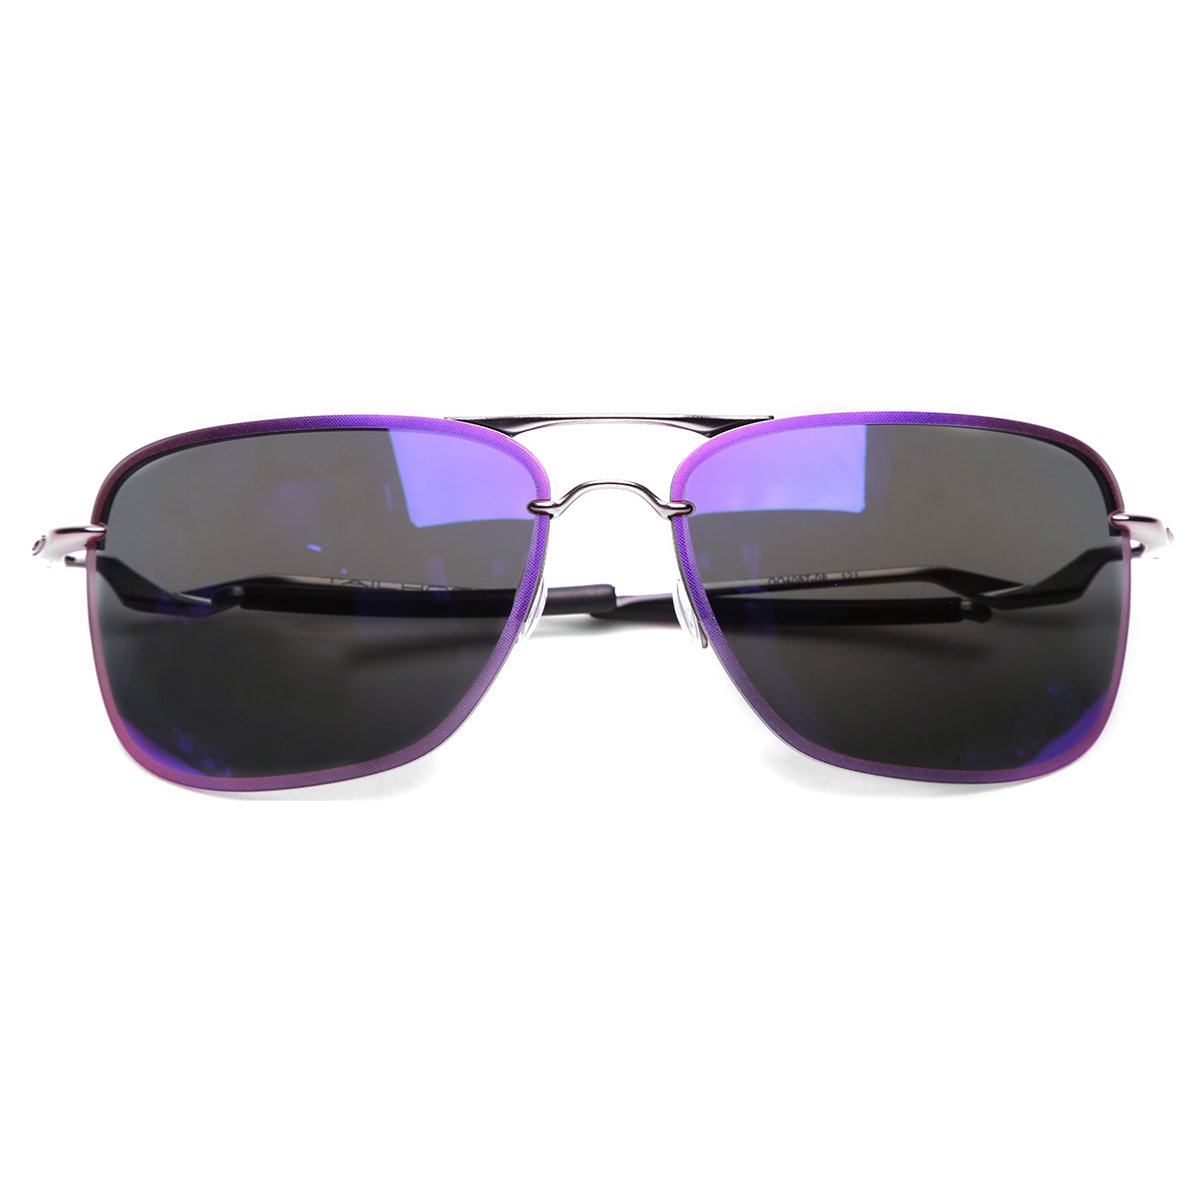 dfb0e91357eae Óculos Oakley Tailhook Lead-Iridium-OO4087 - Compre Agora